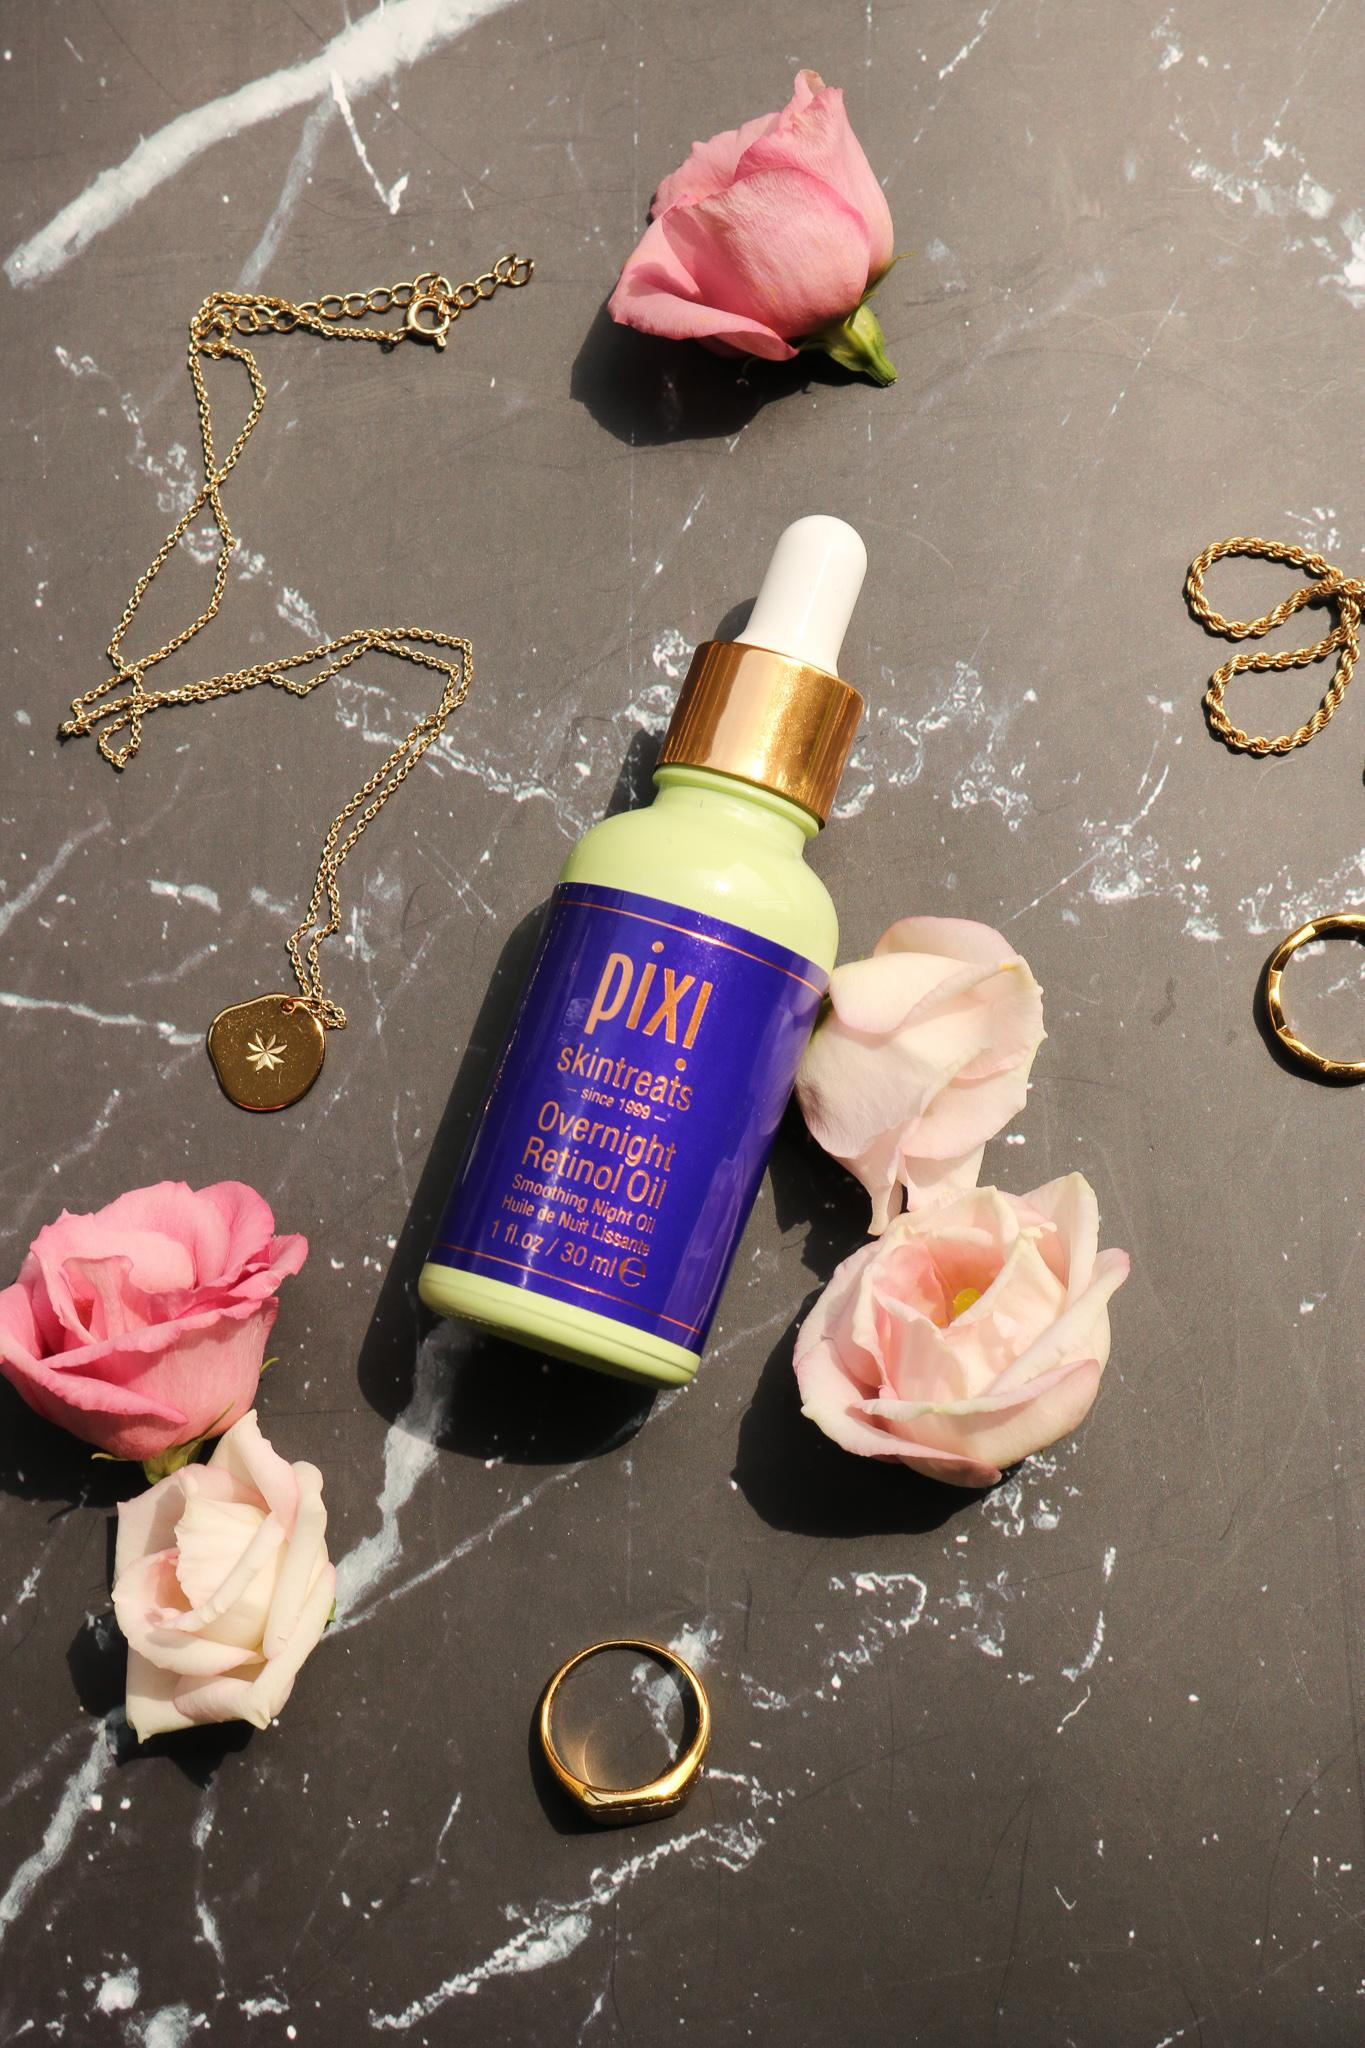 pixi beauty overnight retinol oil